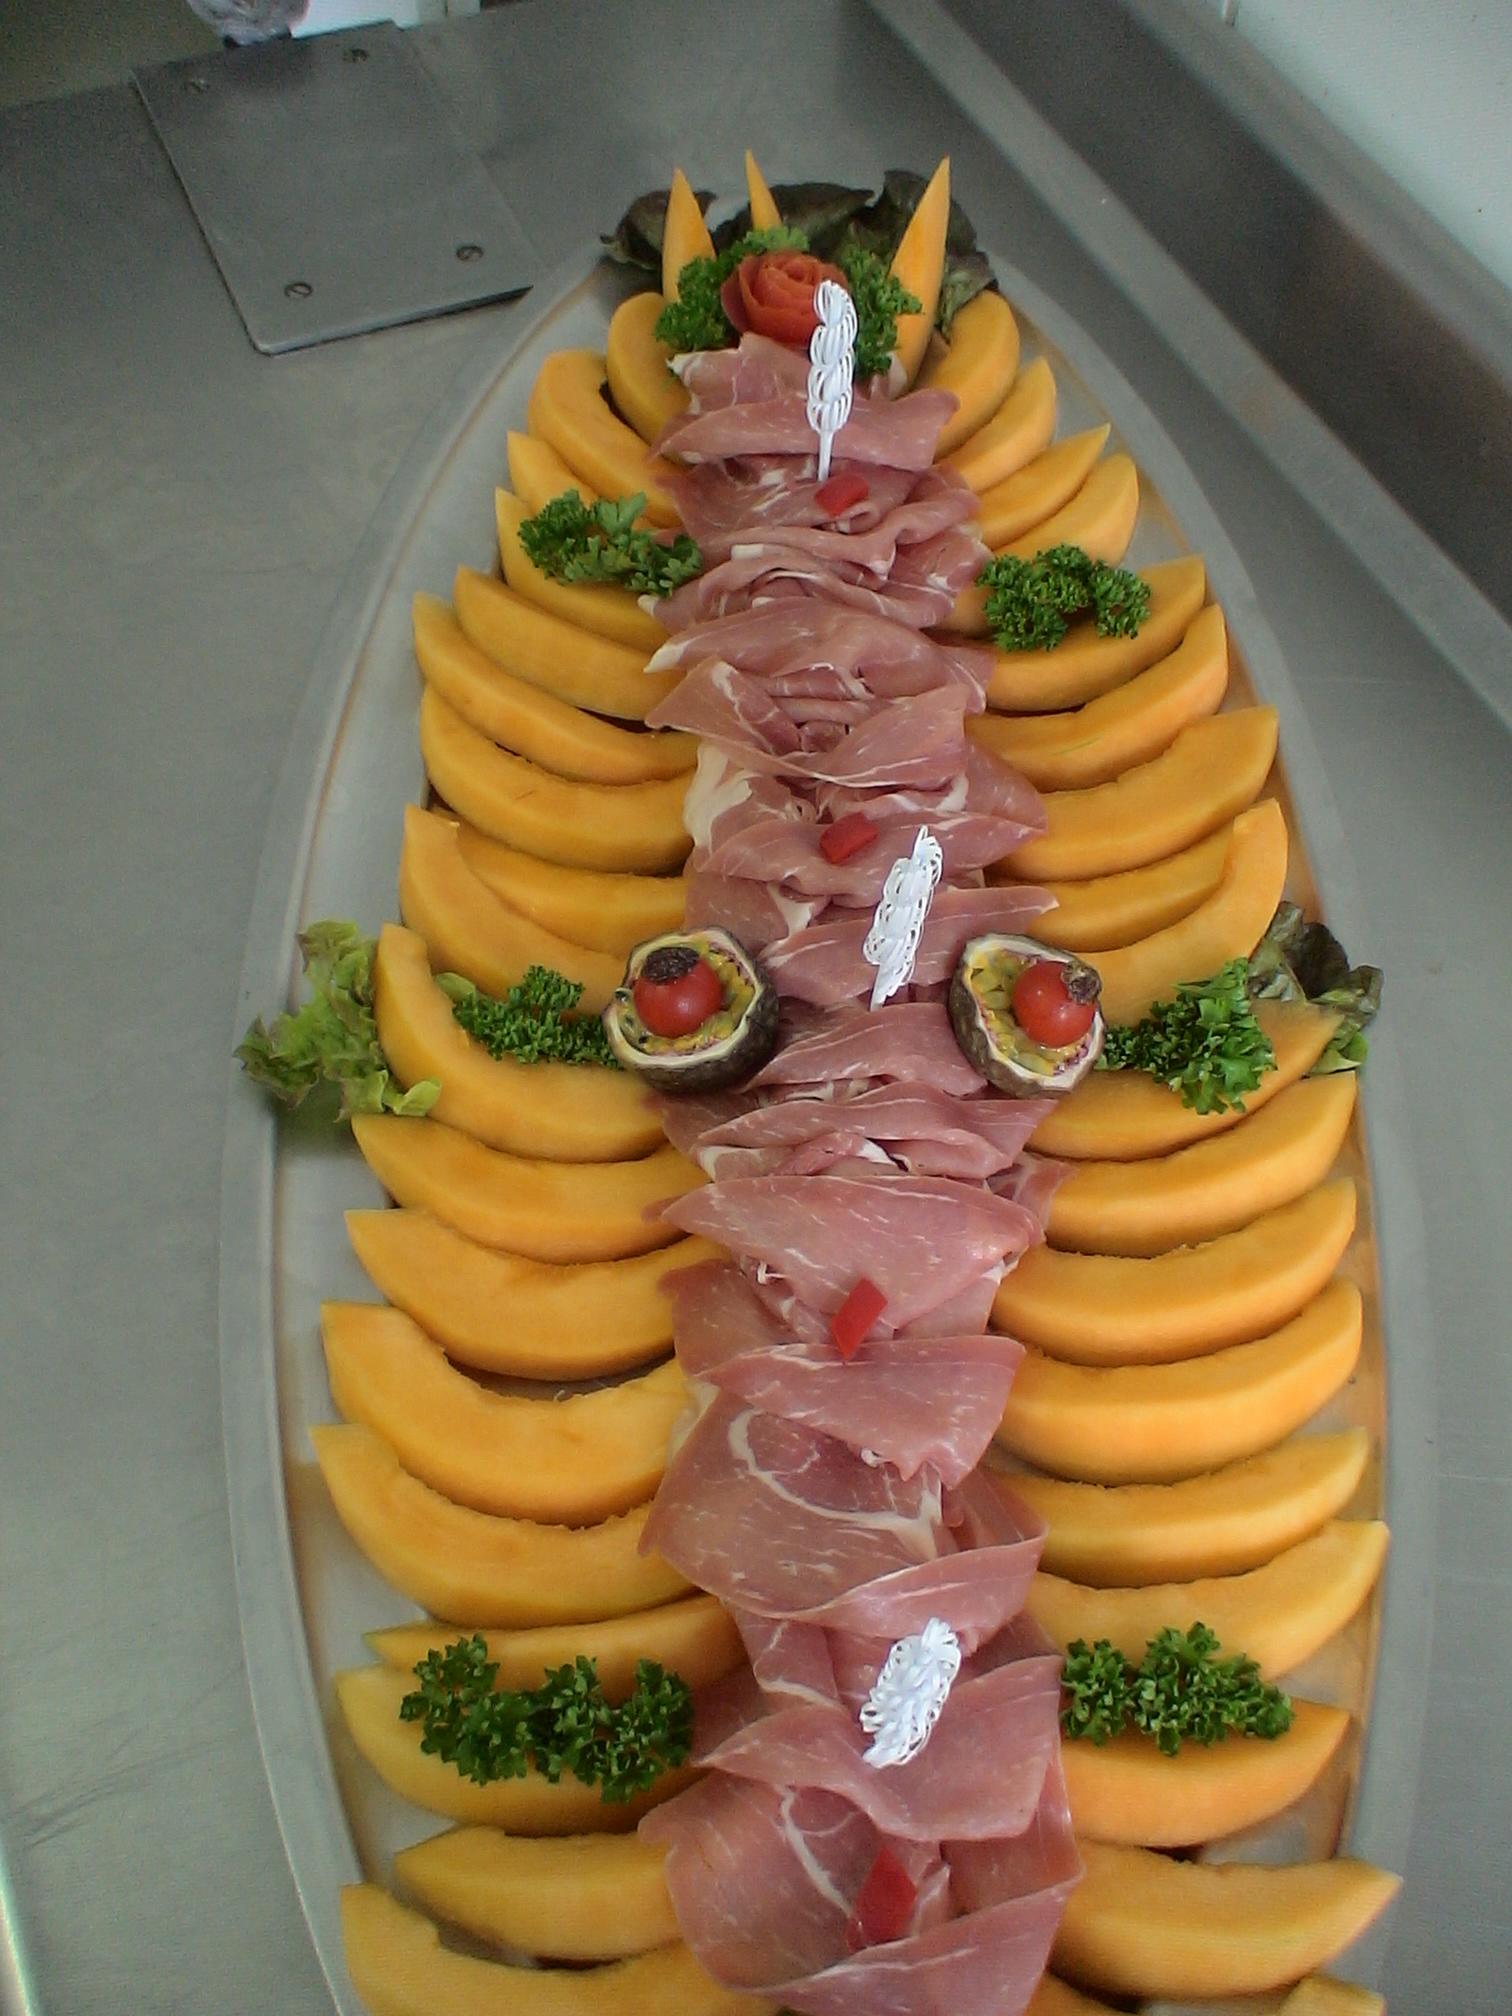 Melon bayonne